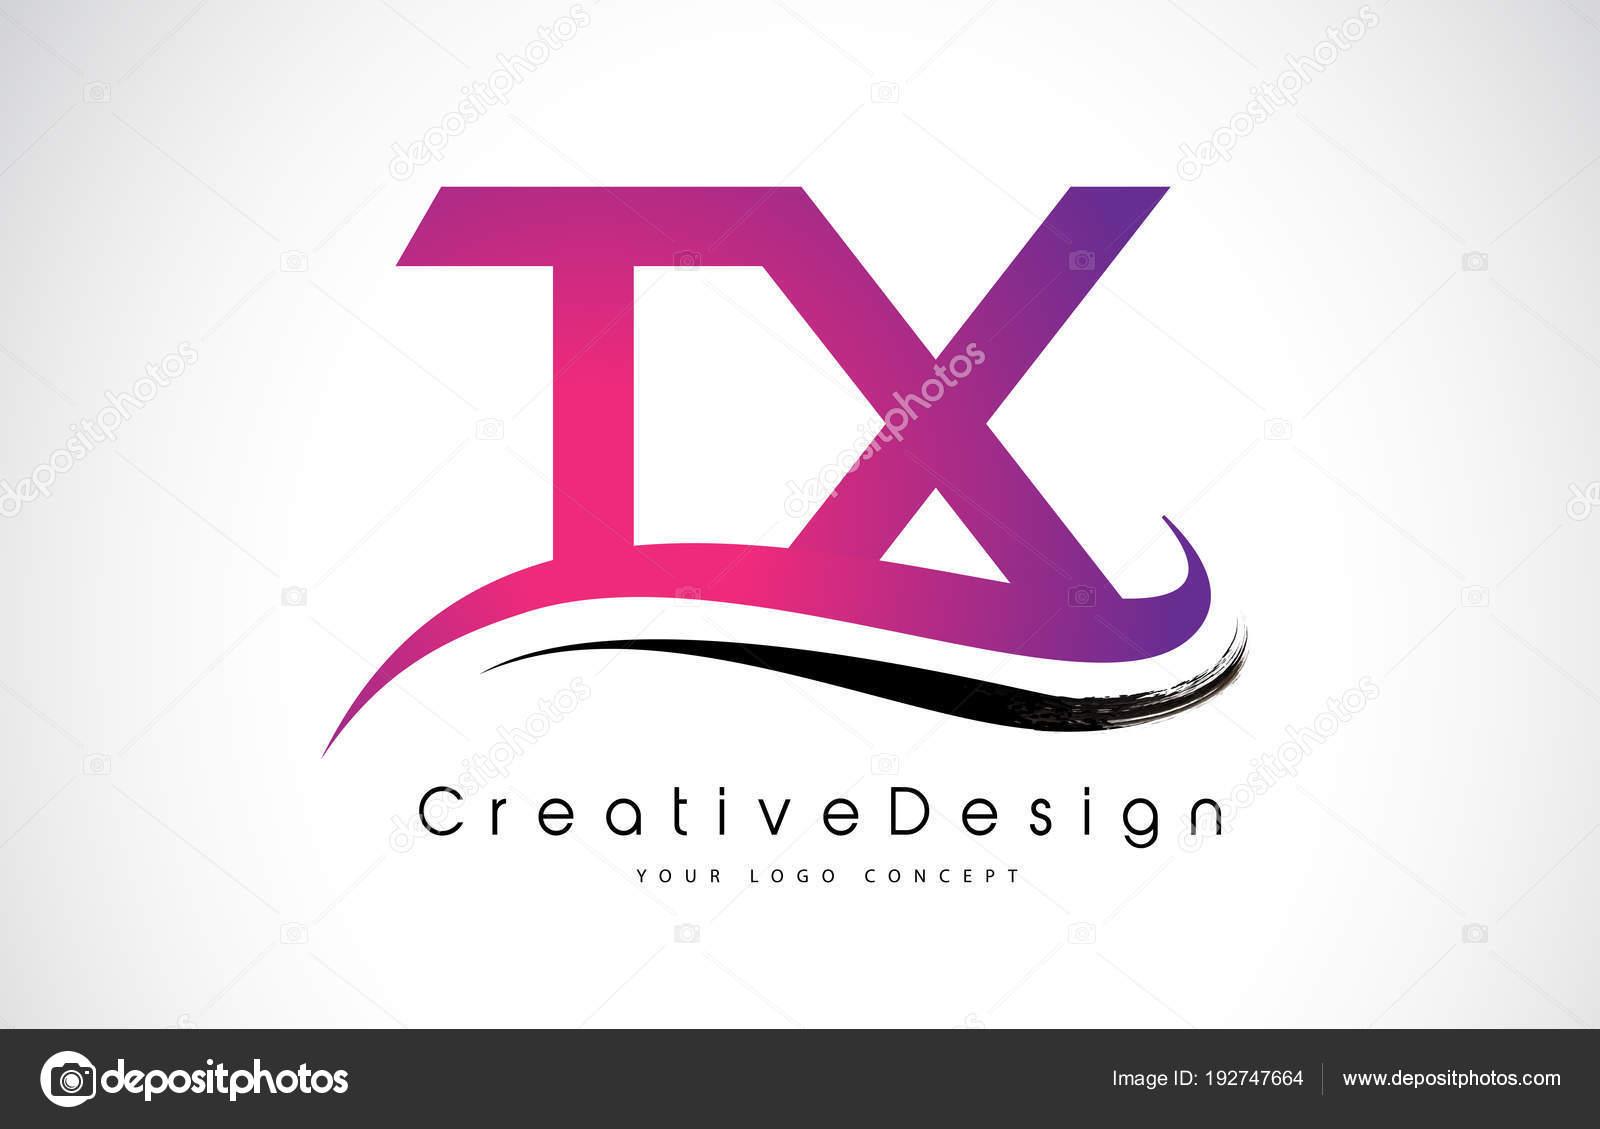 TX T X Letter Logo Design. Creative Icon Modern Letters Vector L ...